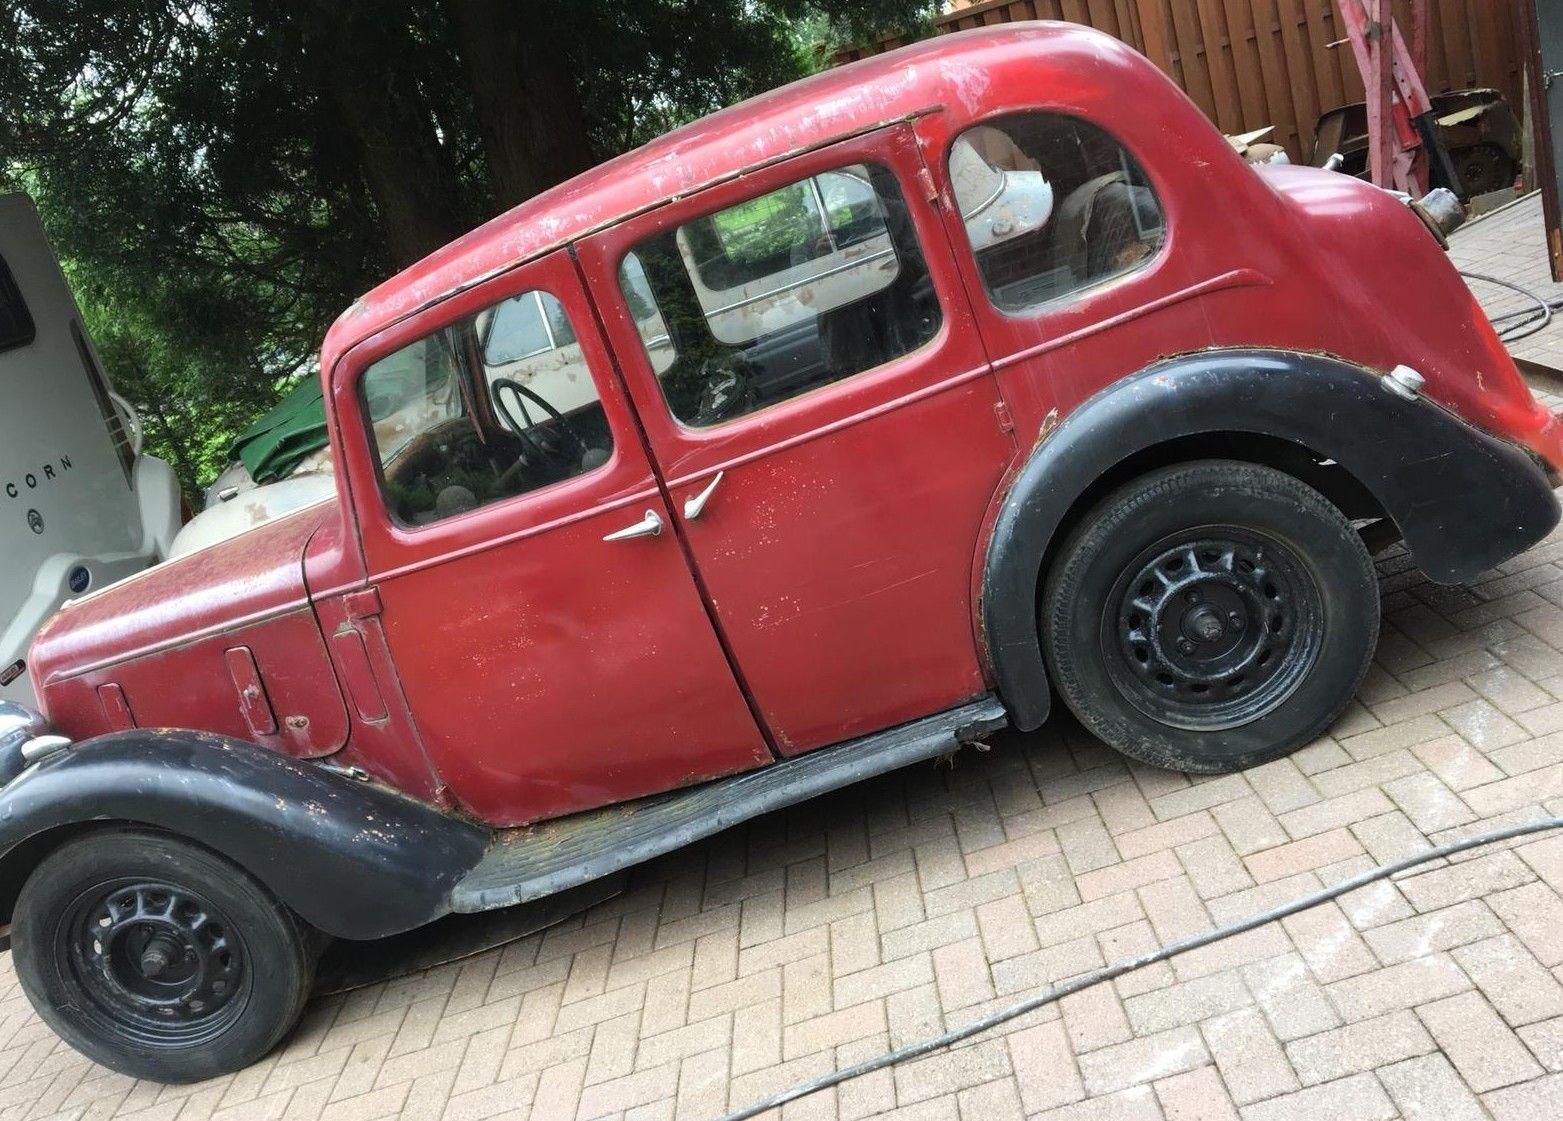 Ebay Austin 10 4 Cambridge Saloon 1937 Pre War To Restore No Reserve Pre1960s Cars British Cars Austin Cars Saloon